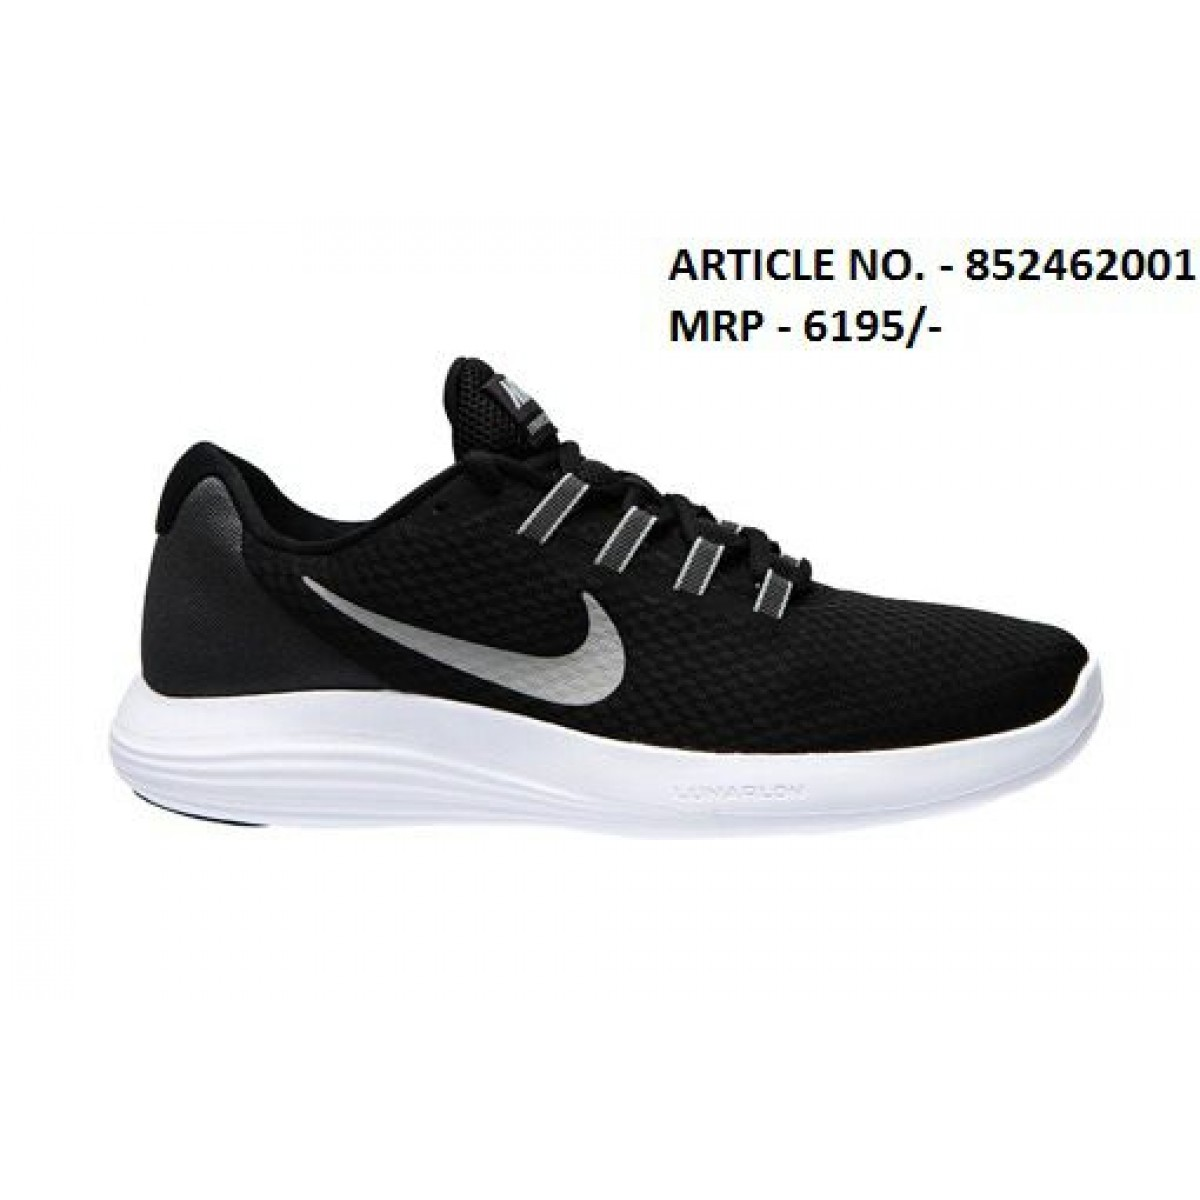 check out fe8d8 f7de0 Nike Sports Shoes -Black - 2017 edition100% Genuine Guarantee